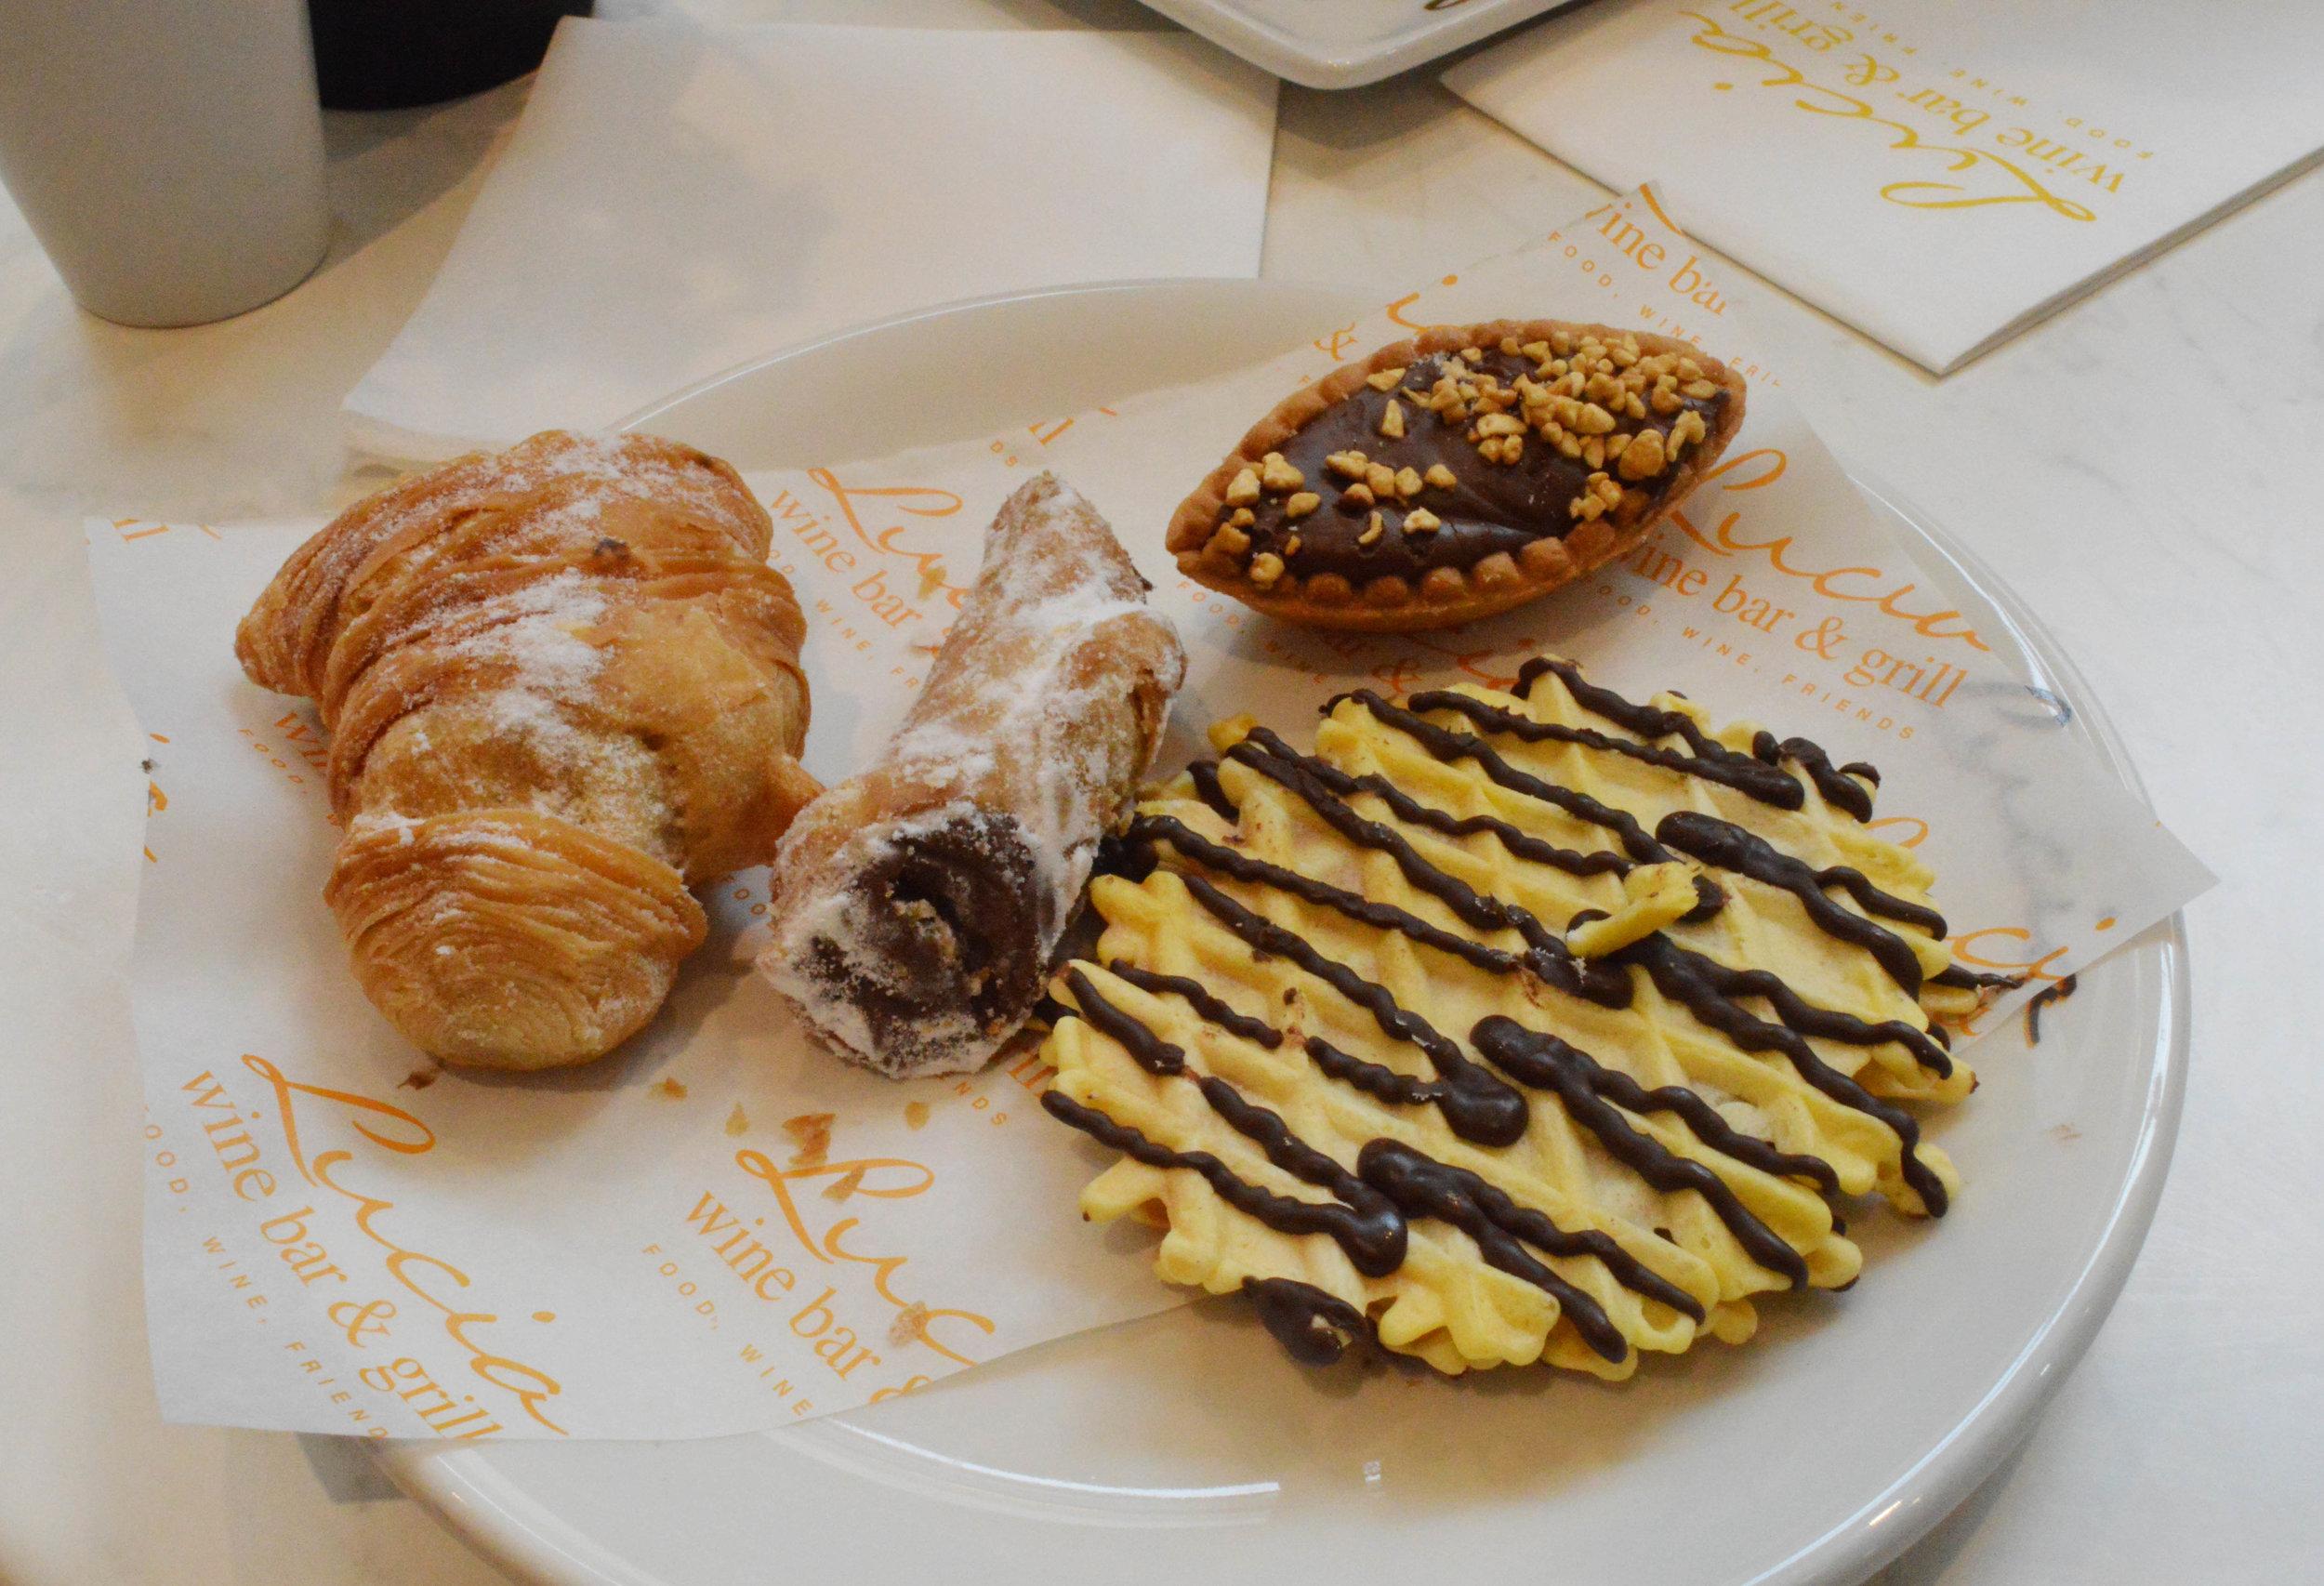 An assortment of italian biscuits/pasties